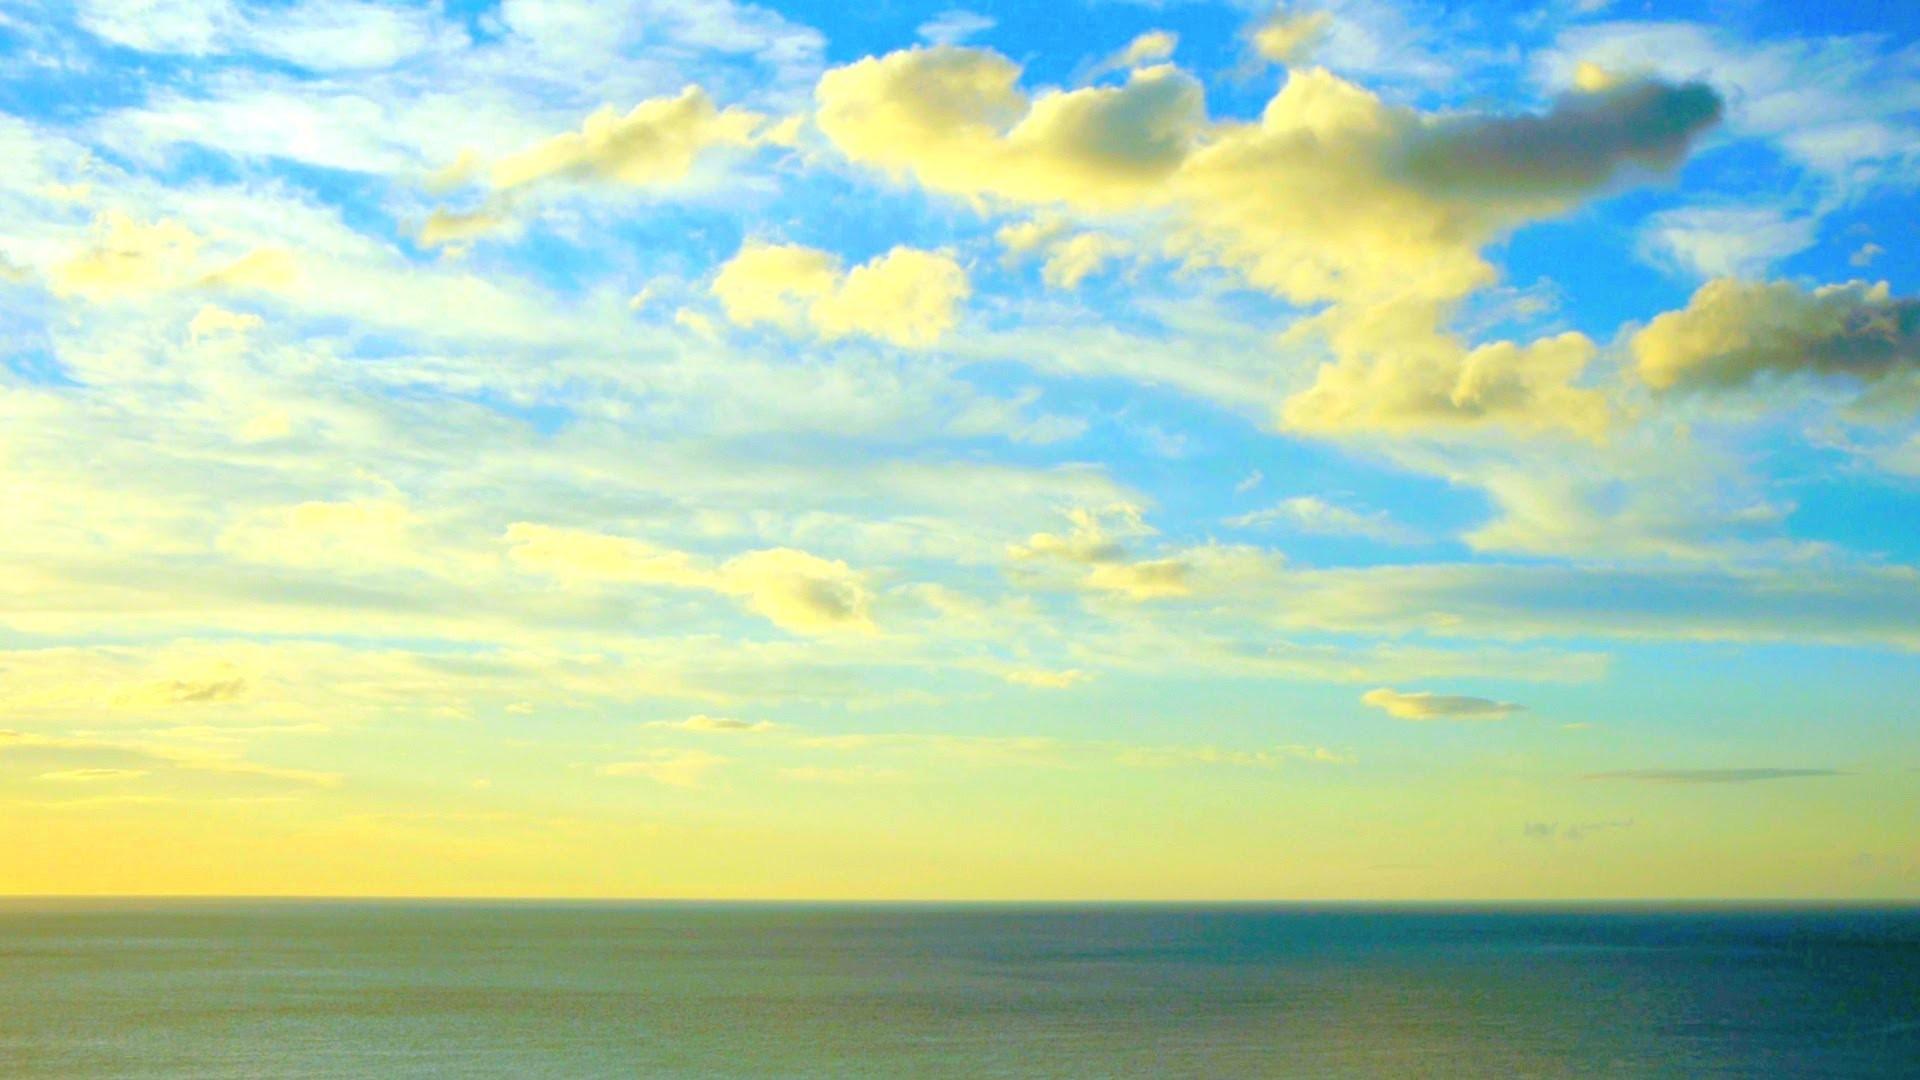 calming backgrounds 183��